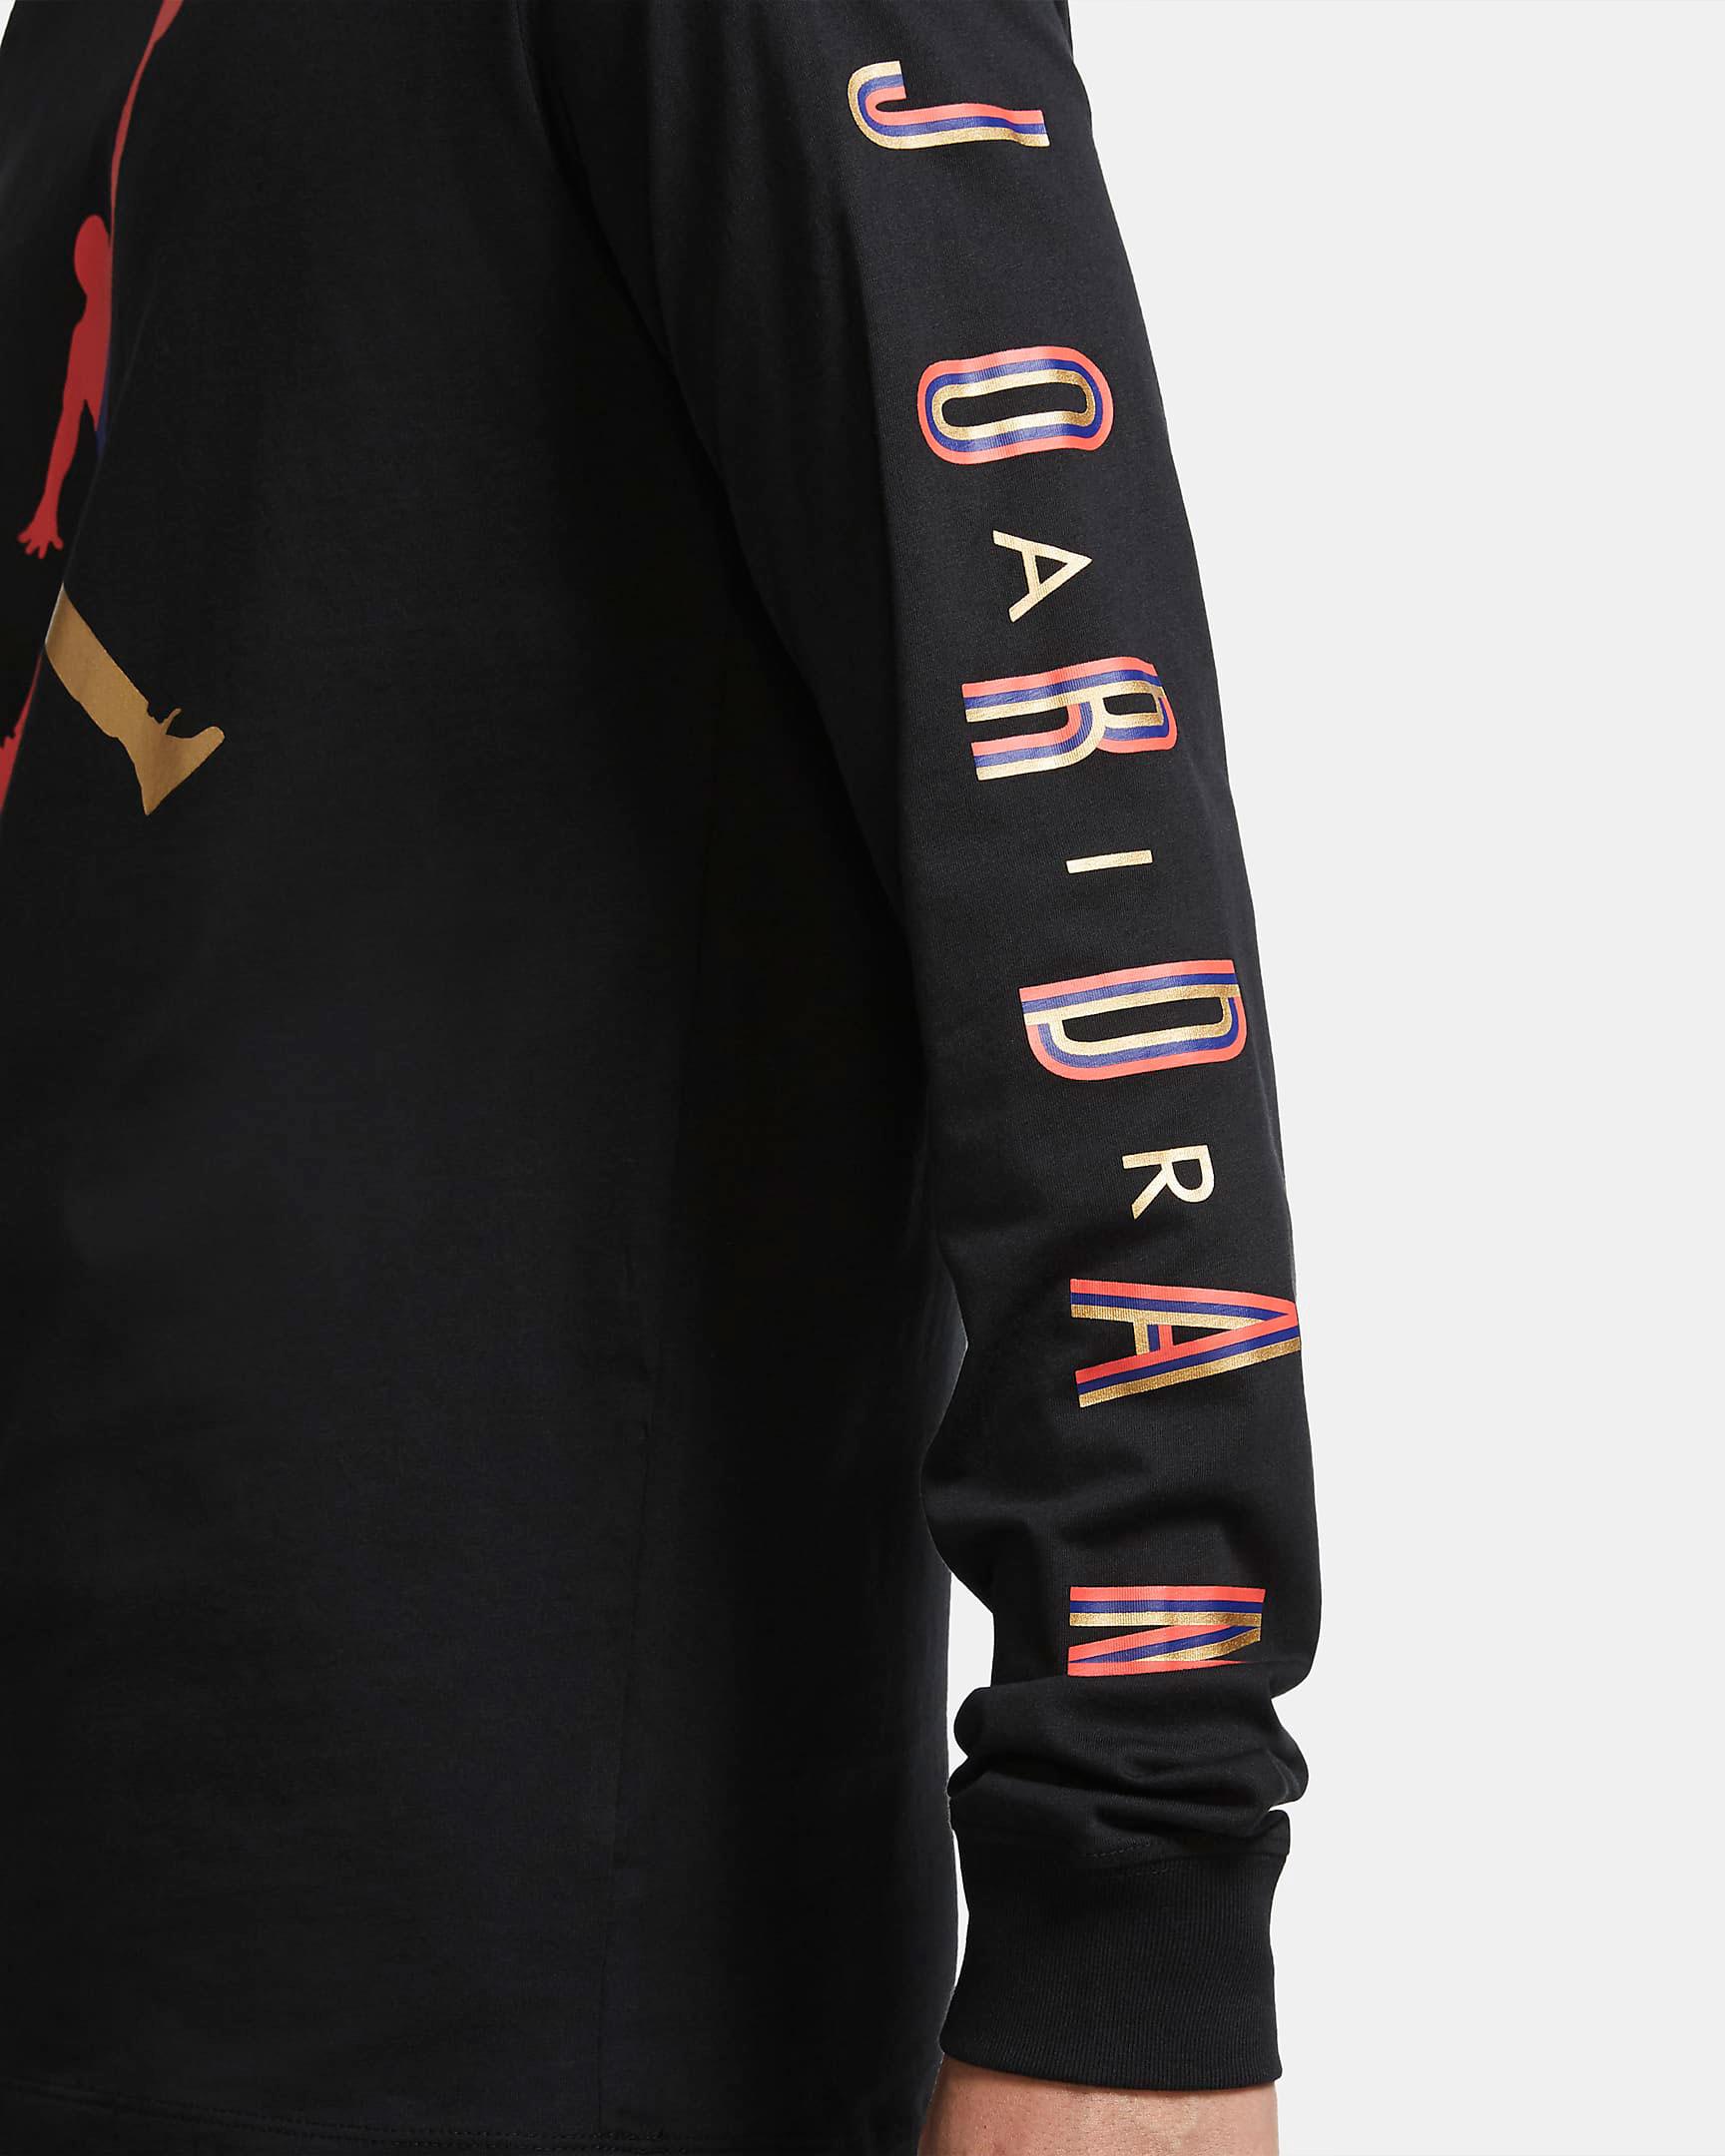 air-jordan-7-greater-china-long-sleeve-shirt-match-2